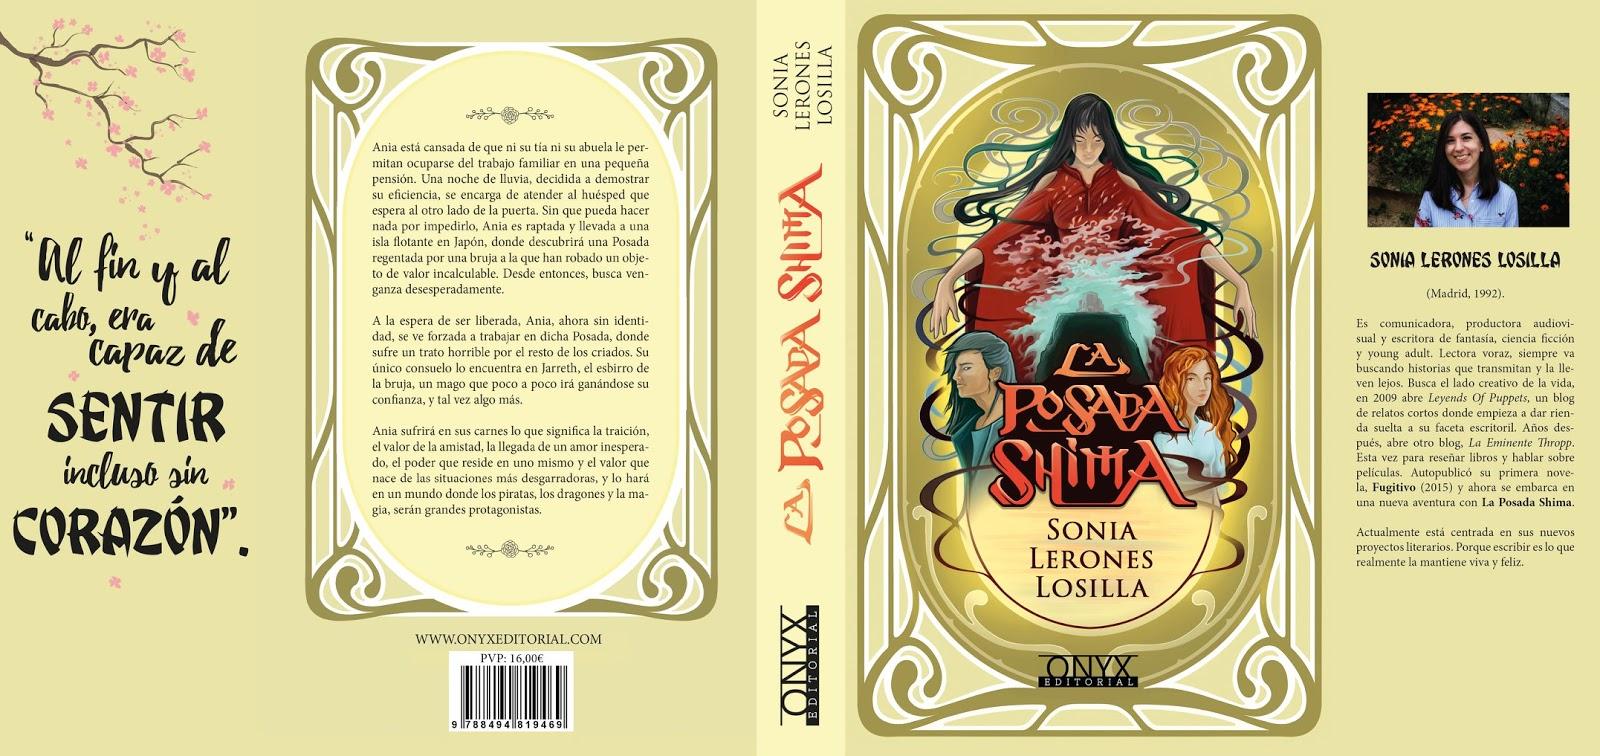 Recomendaciones: La posada Shima